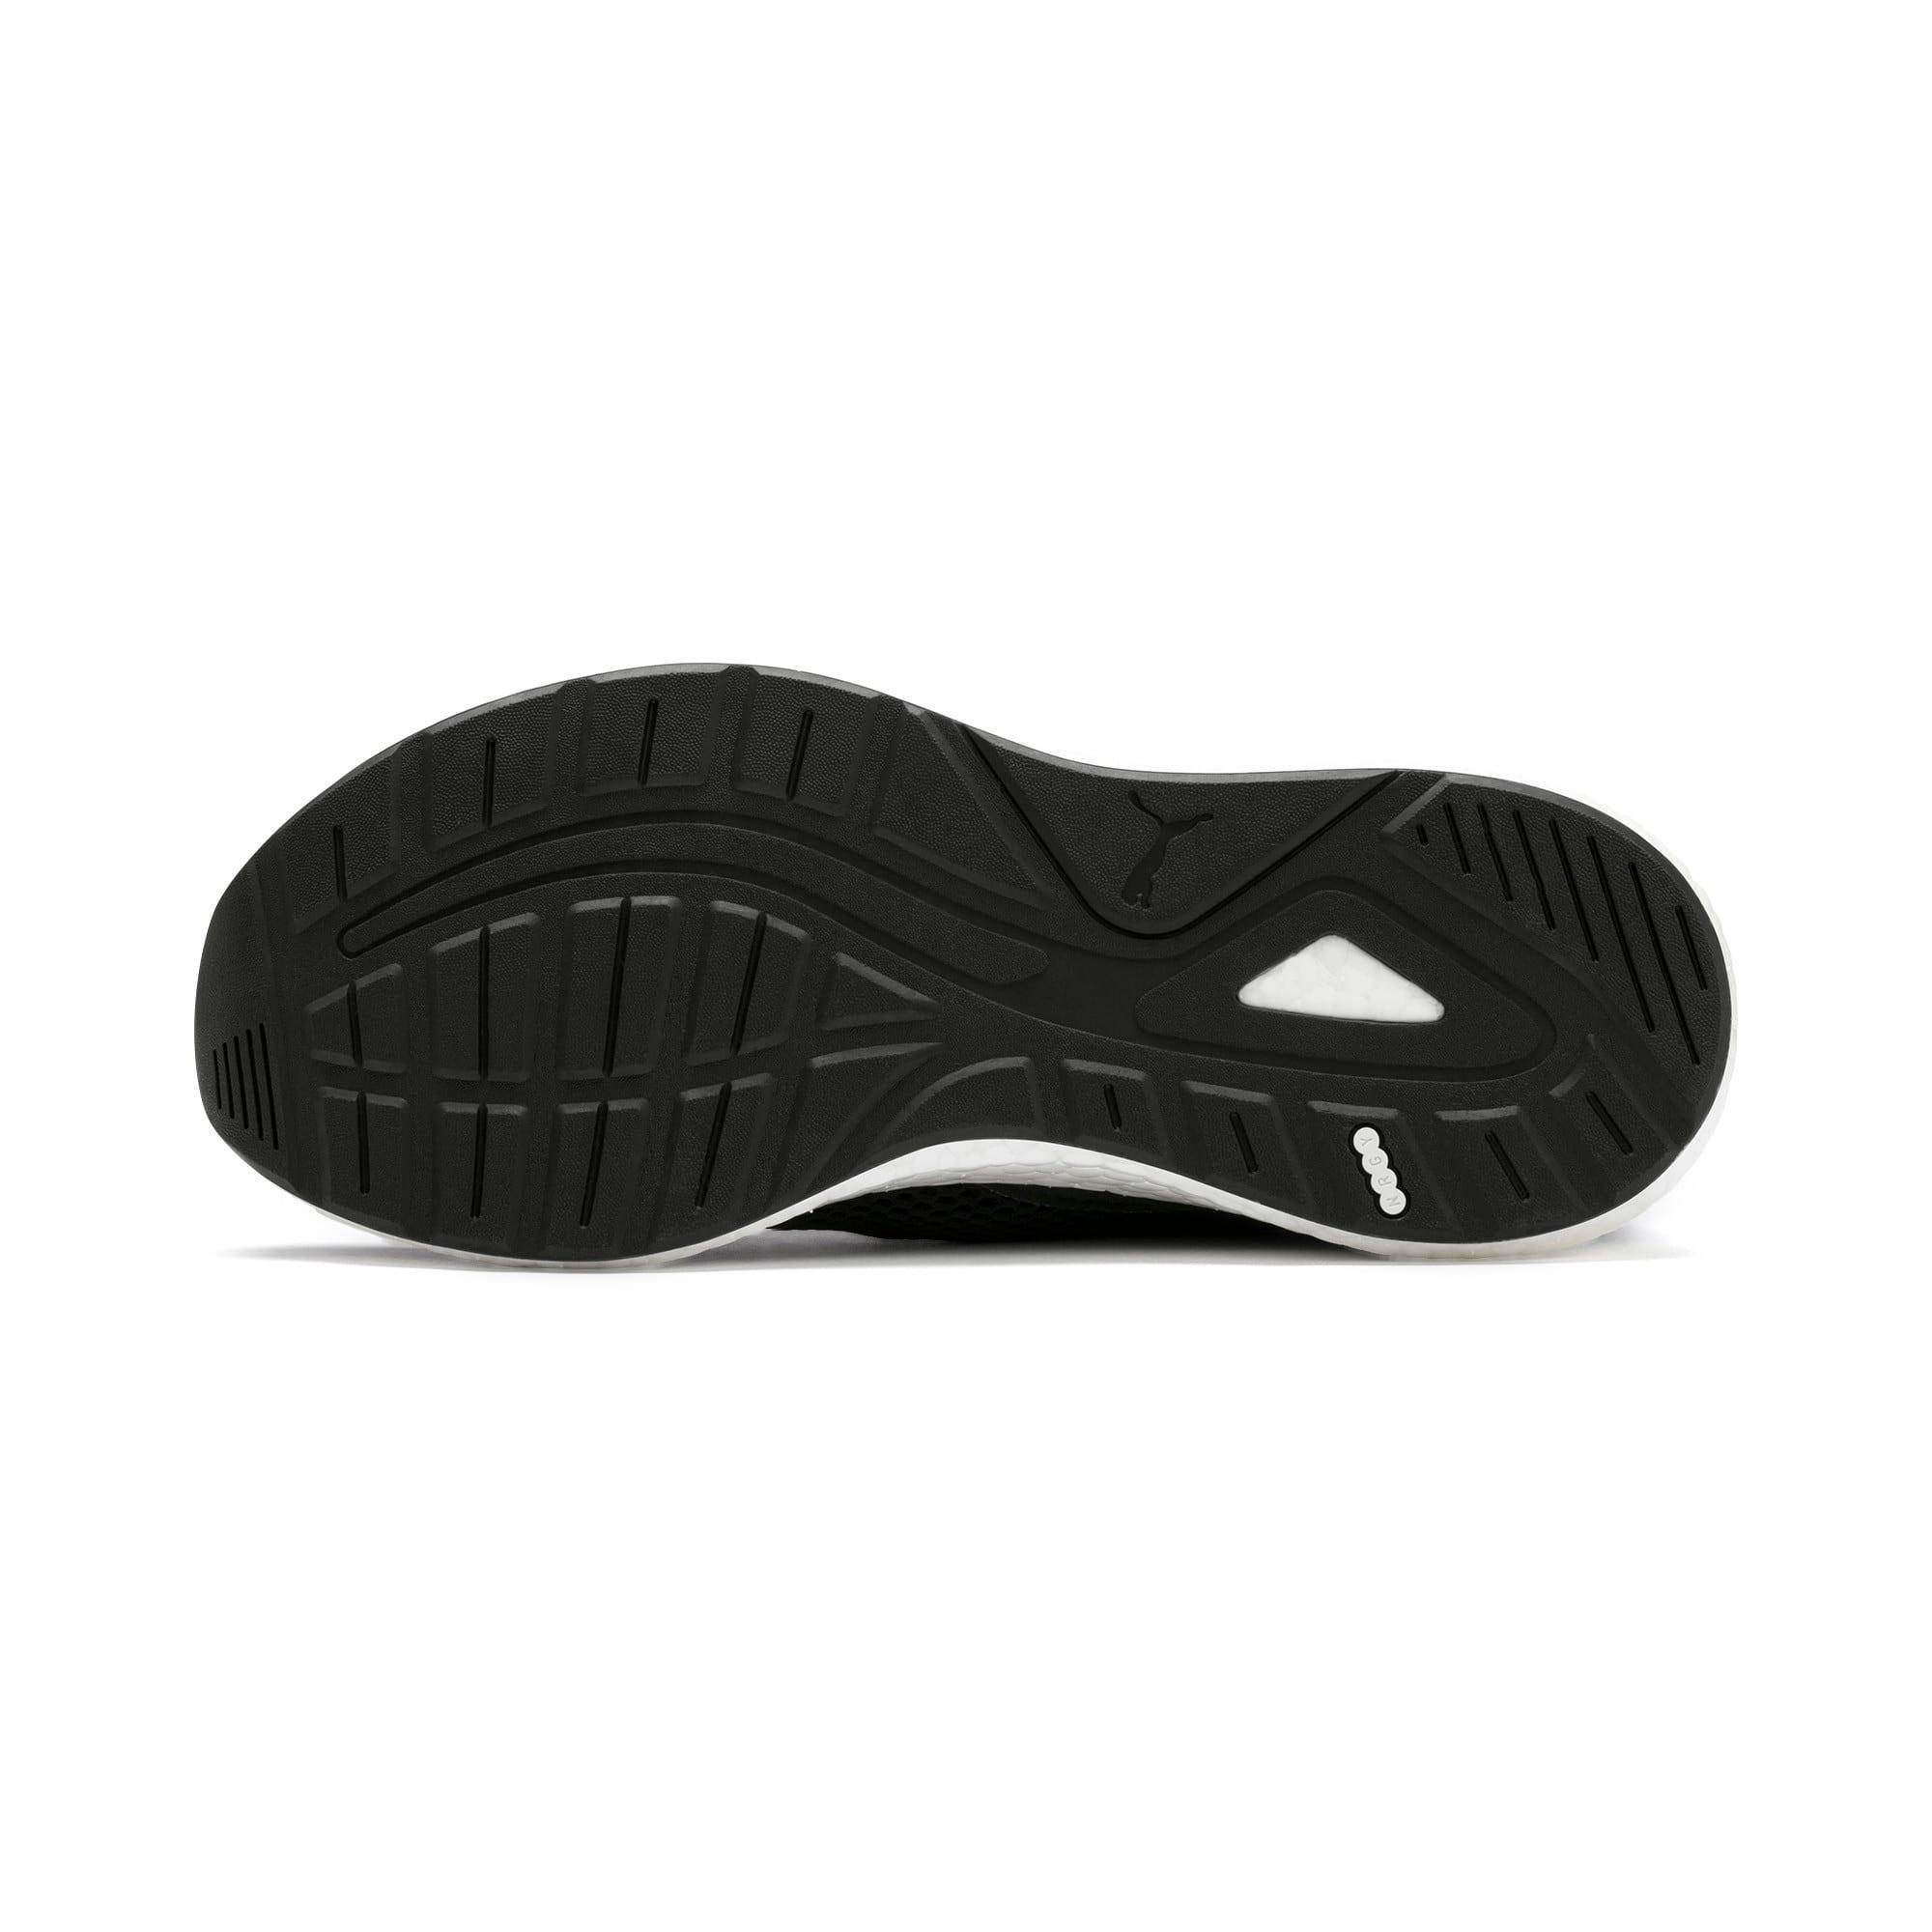 Thumbnail 5 of NRGY Neko Skim Women's Running Shoes, Puma Black-Puma Silver, medium